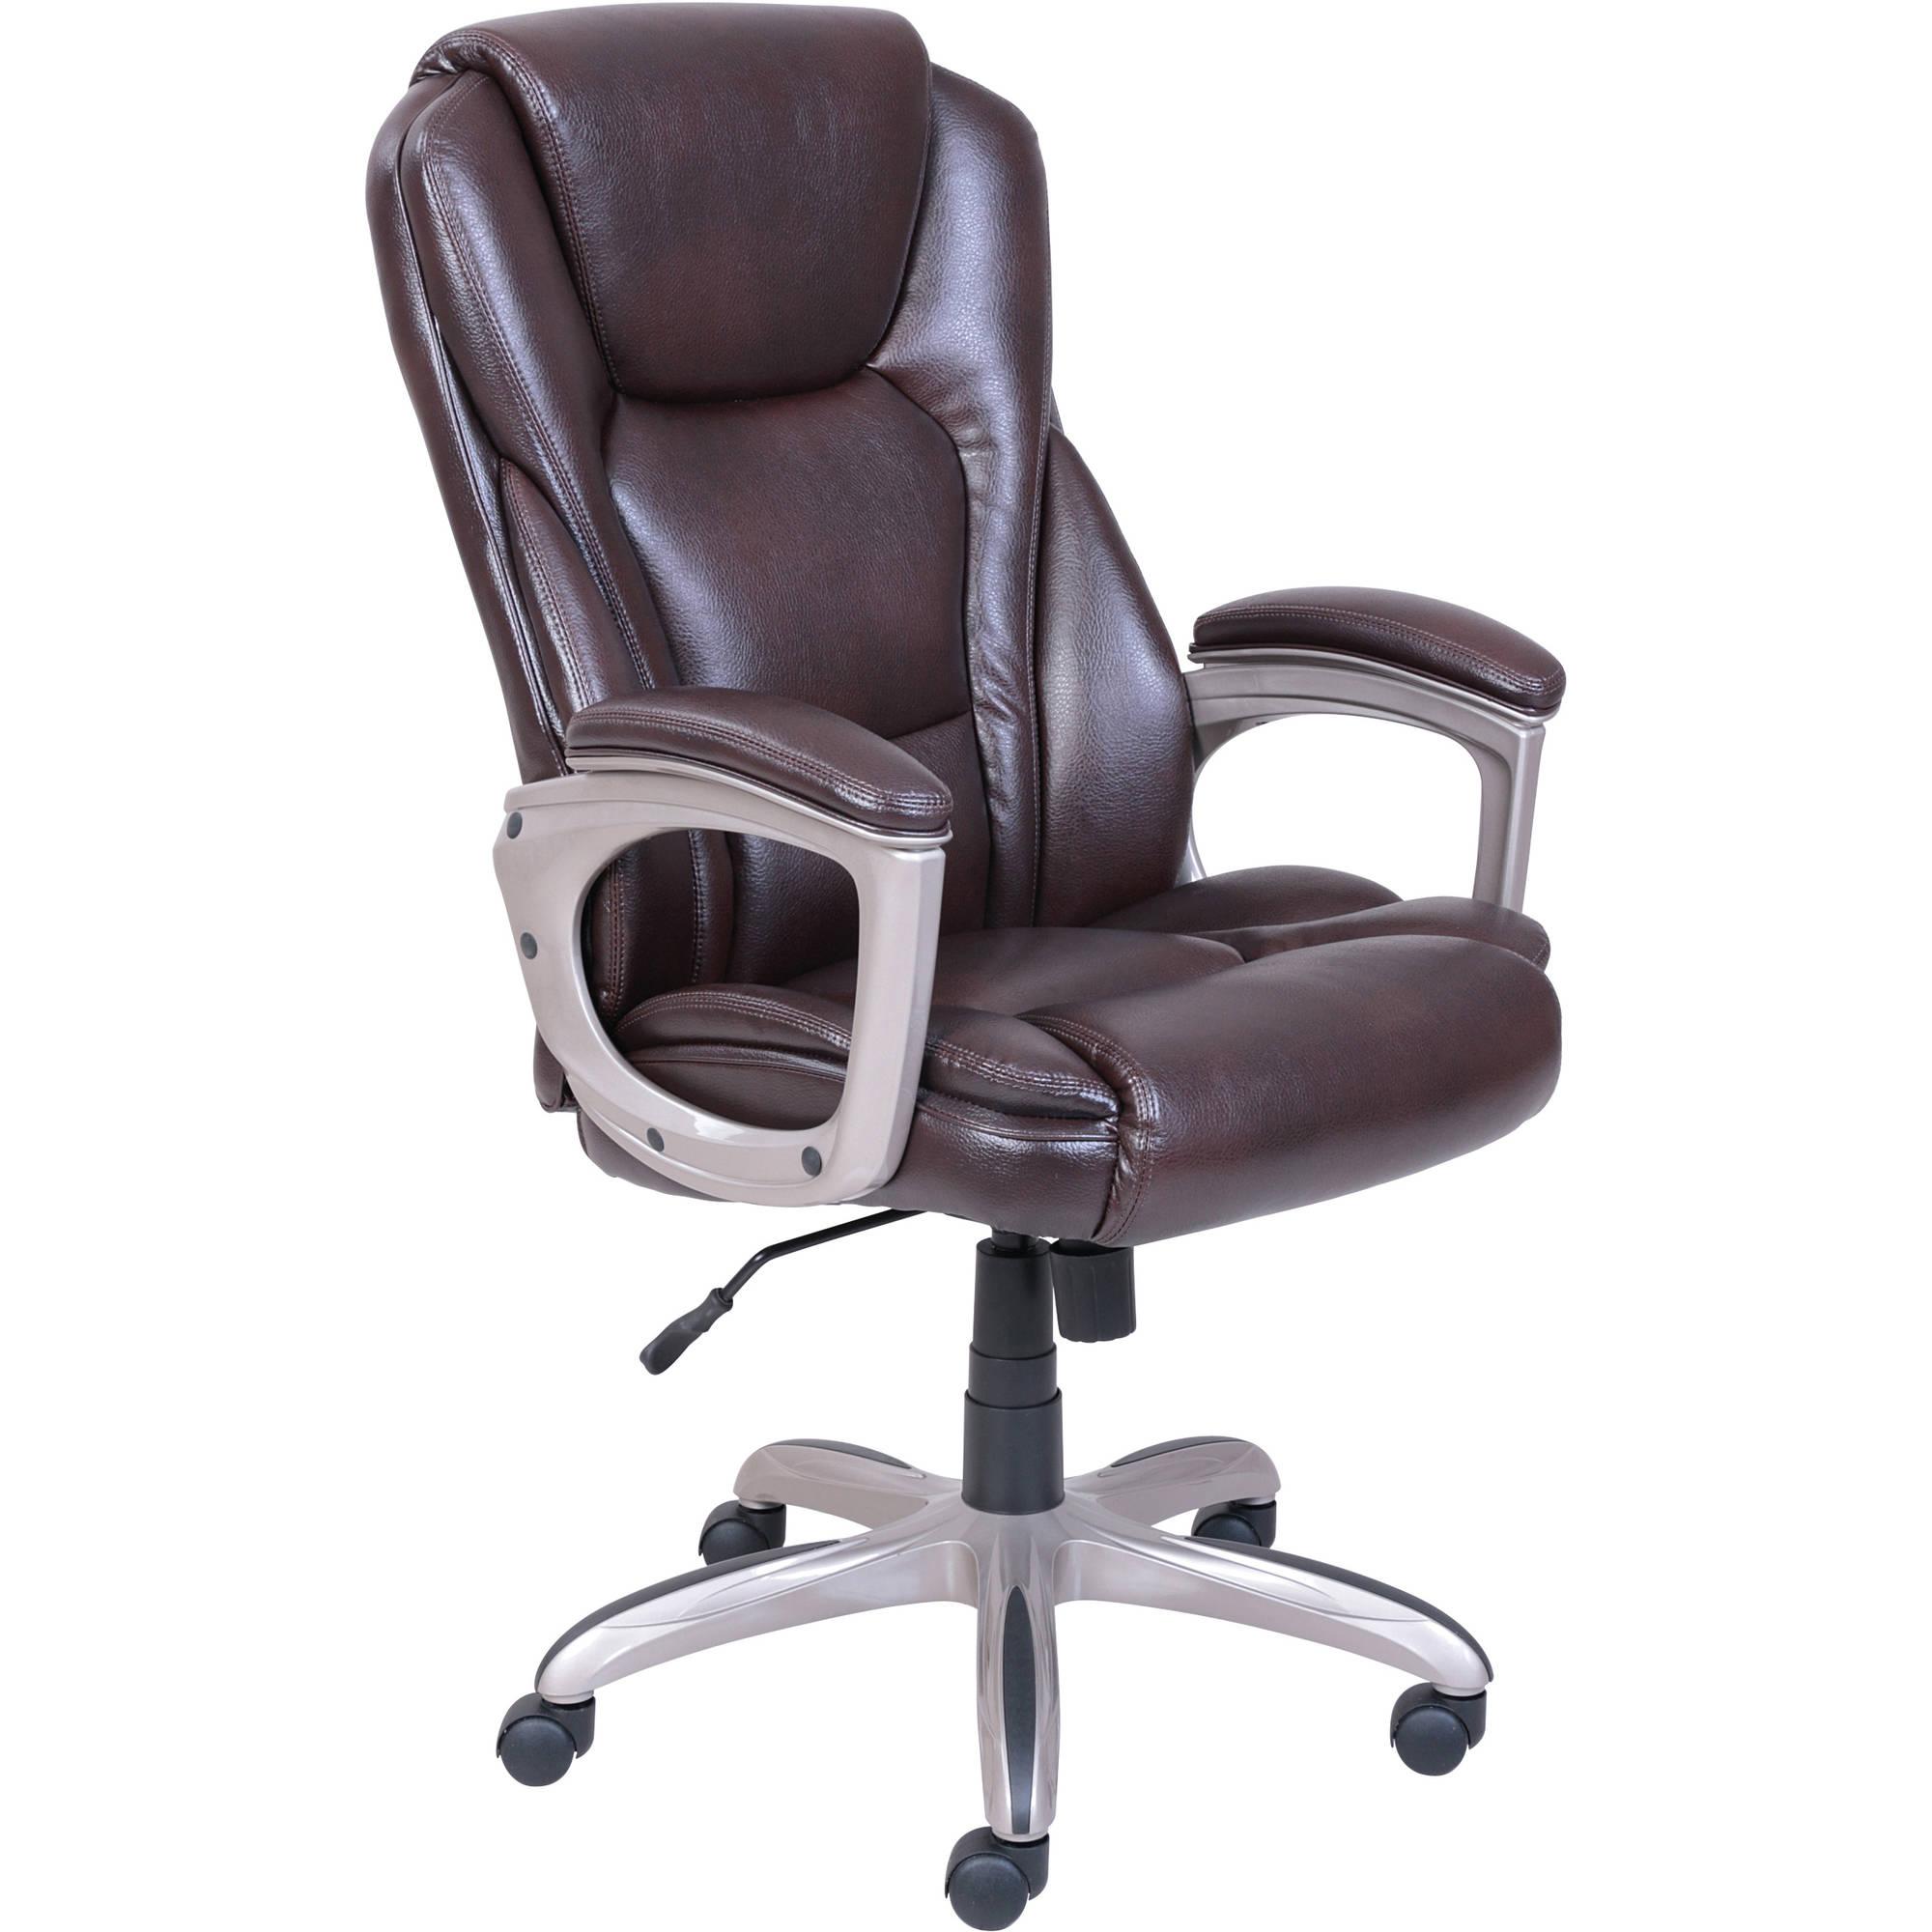 Serta Big & Tall Commercial Office Chair w/ Memory Foam